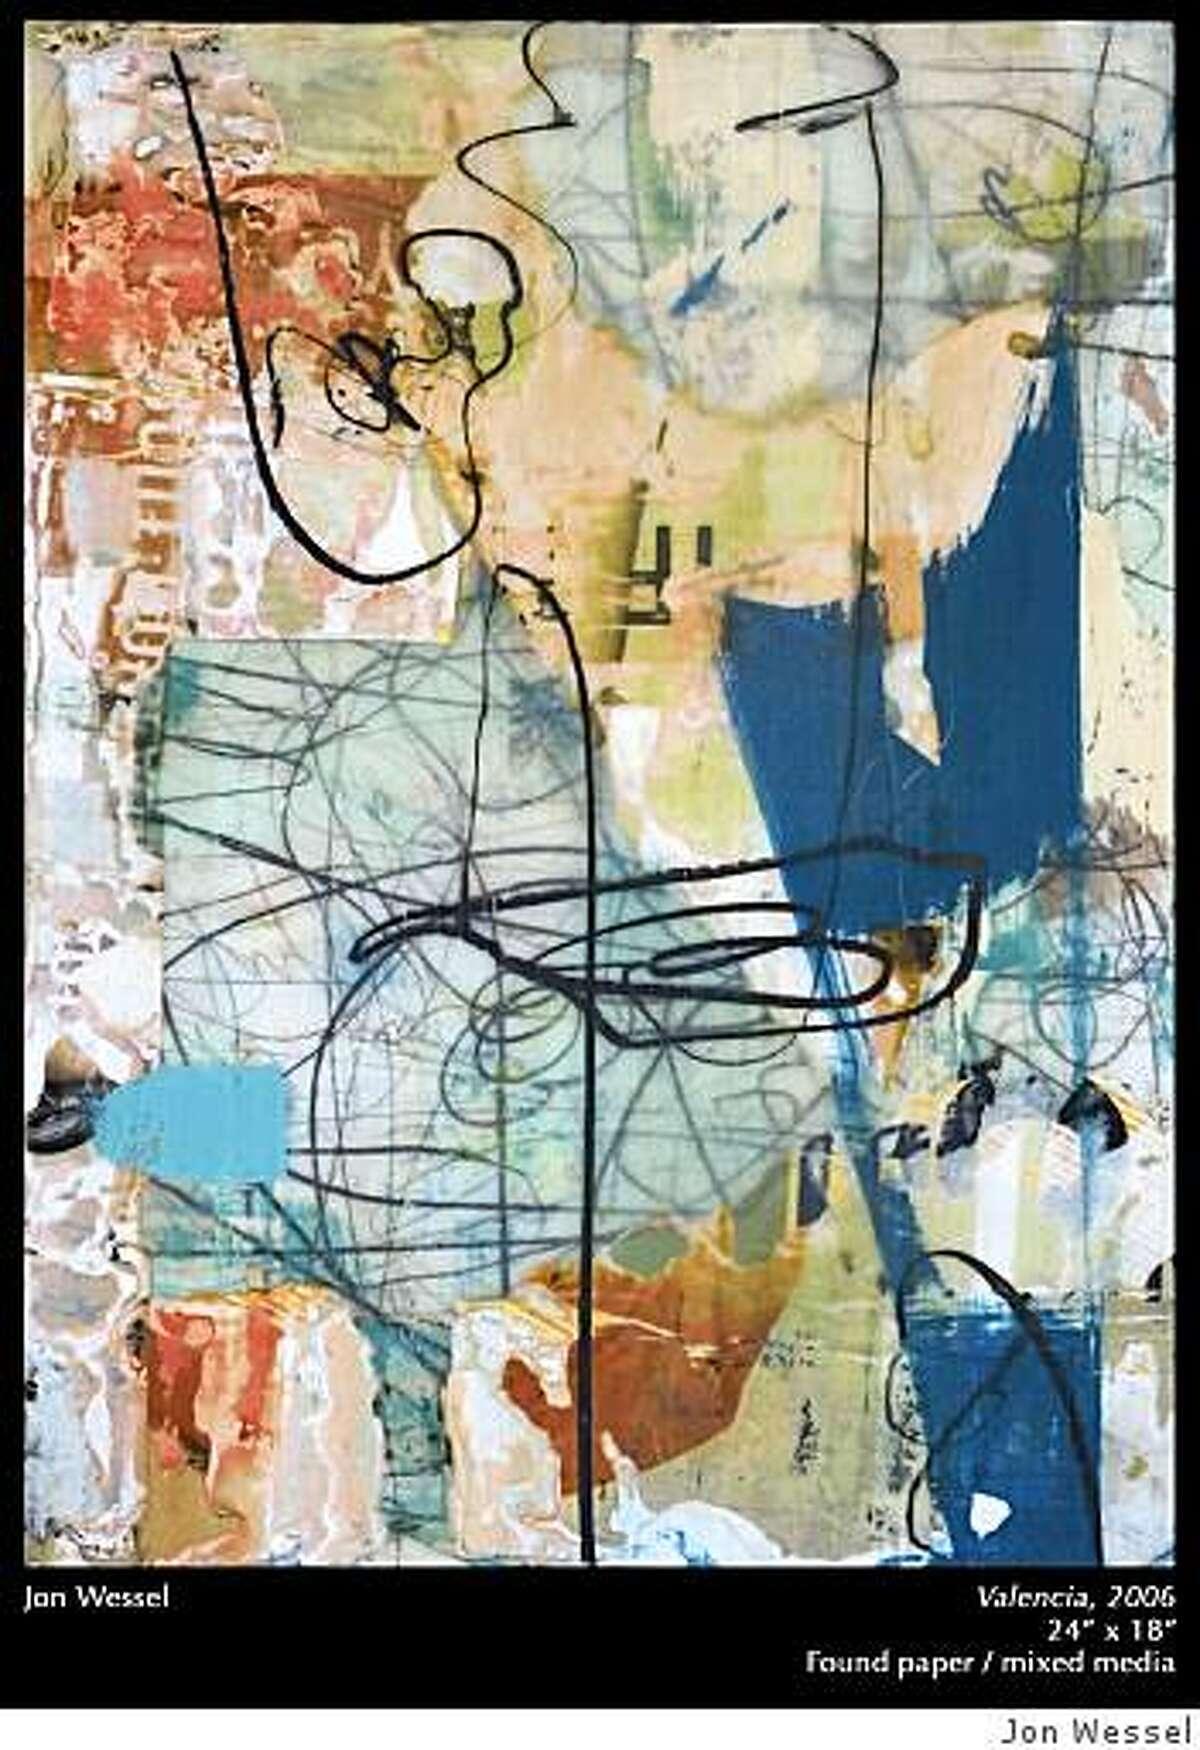 Jon Wessel painting